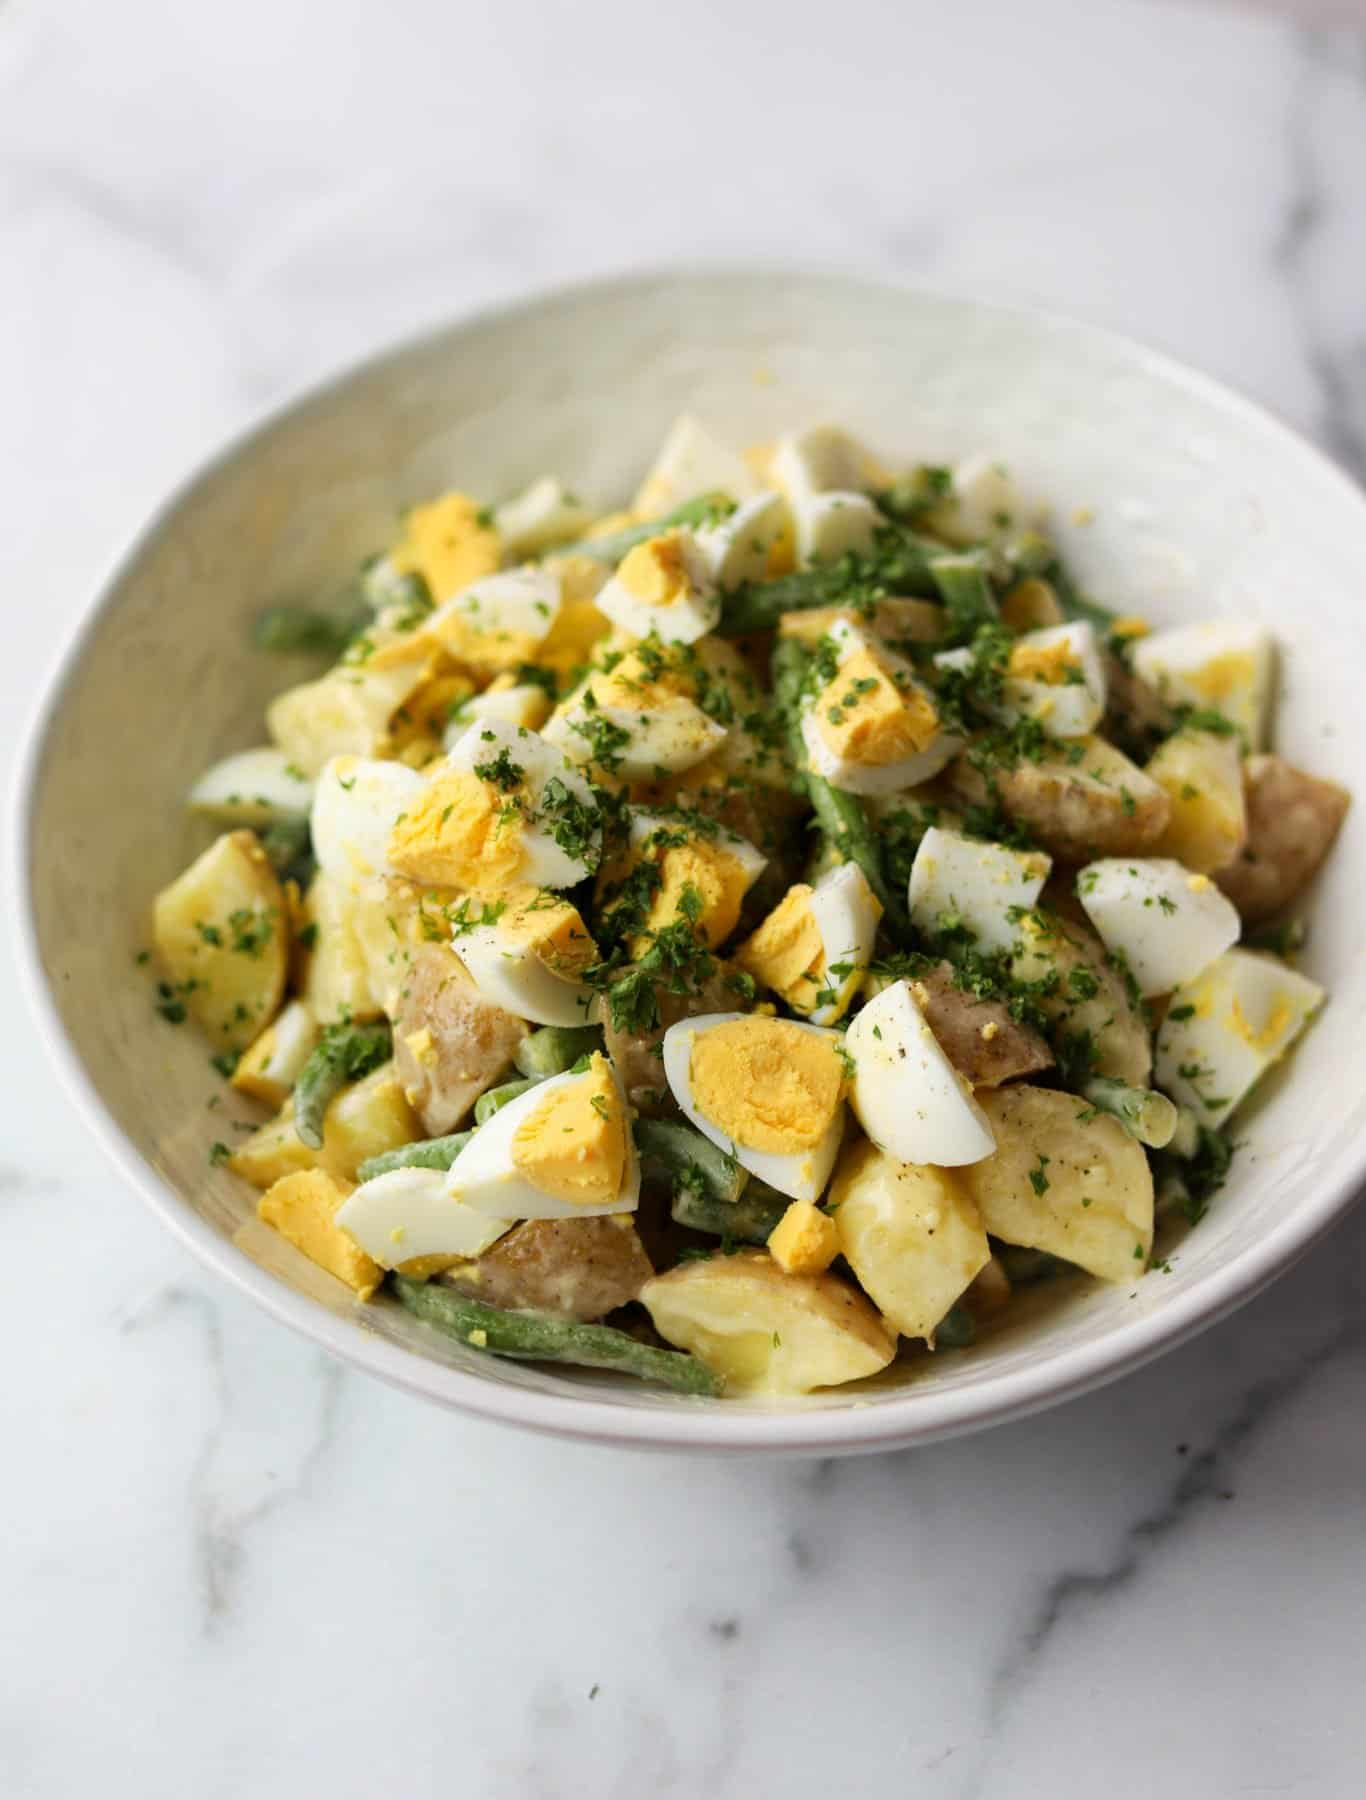 Green bean potato salad in a white bowl